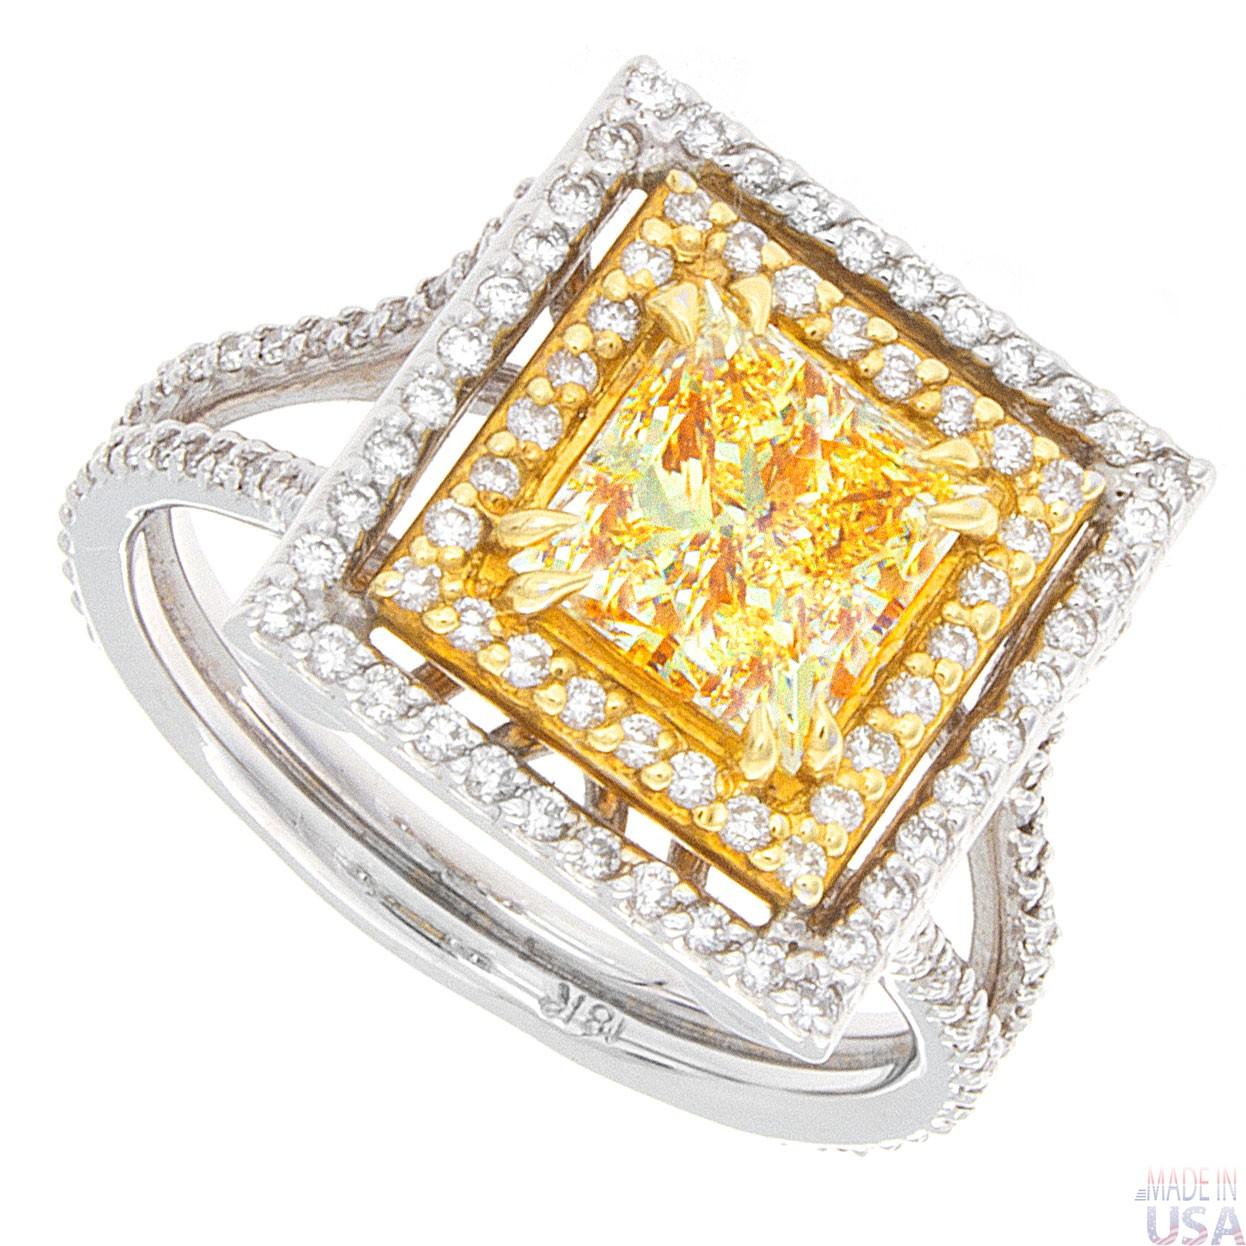 200ct Princess Cut Fancy Yellow Diamond Engagement Ring